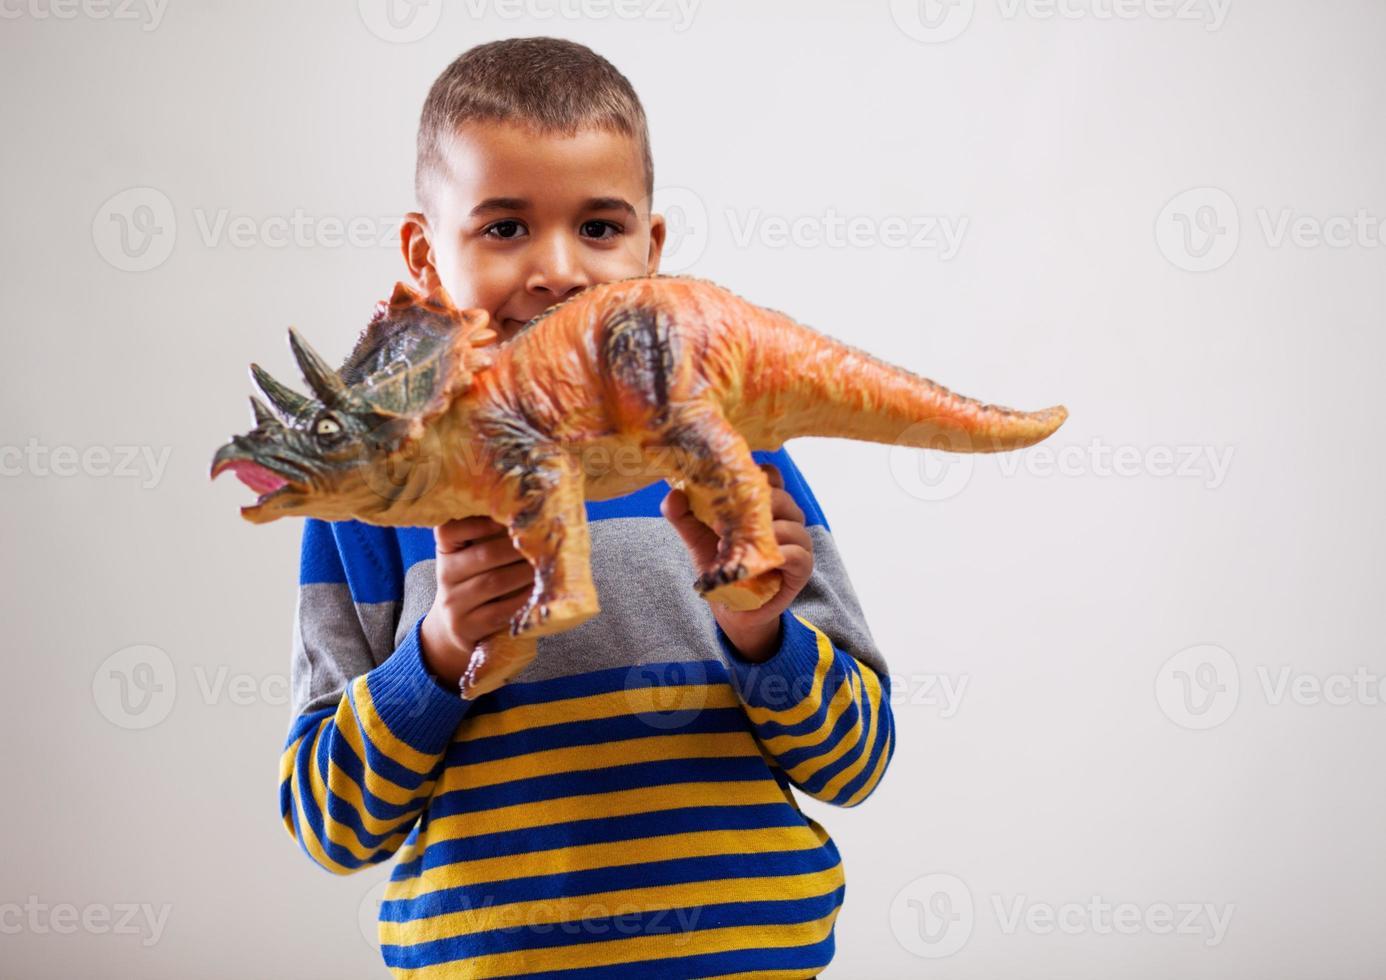 kind en speelgoed foto